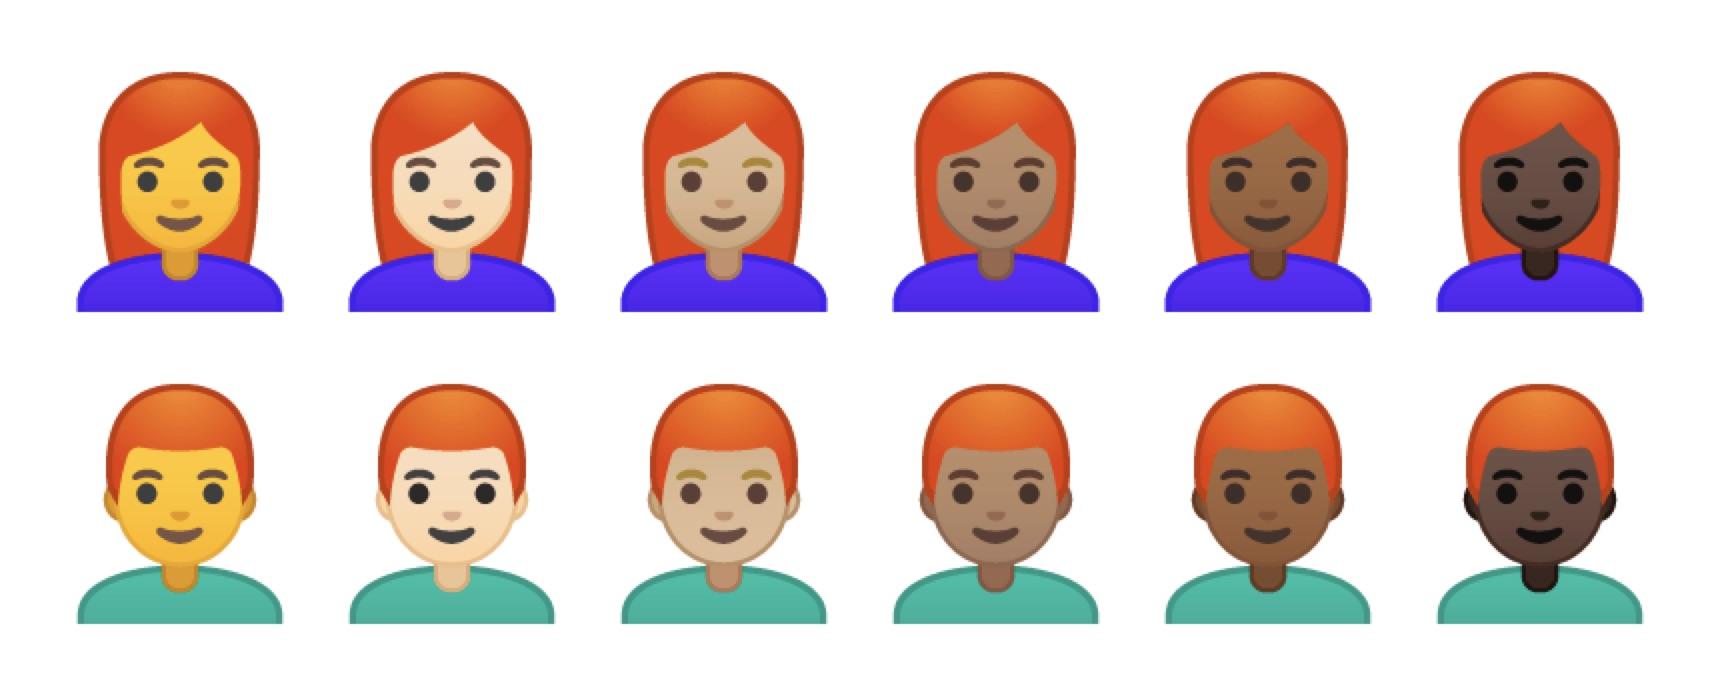 emoji-redheads-android-p-beta-emojipedia